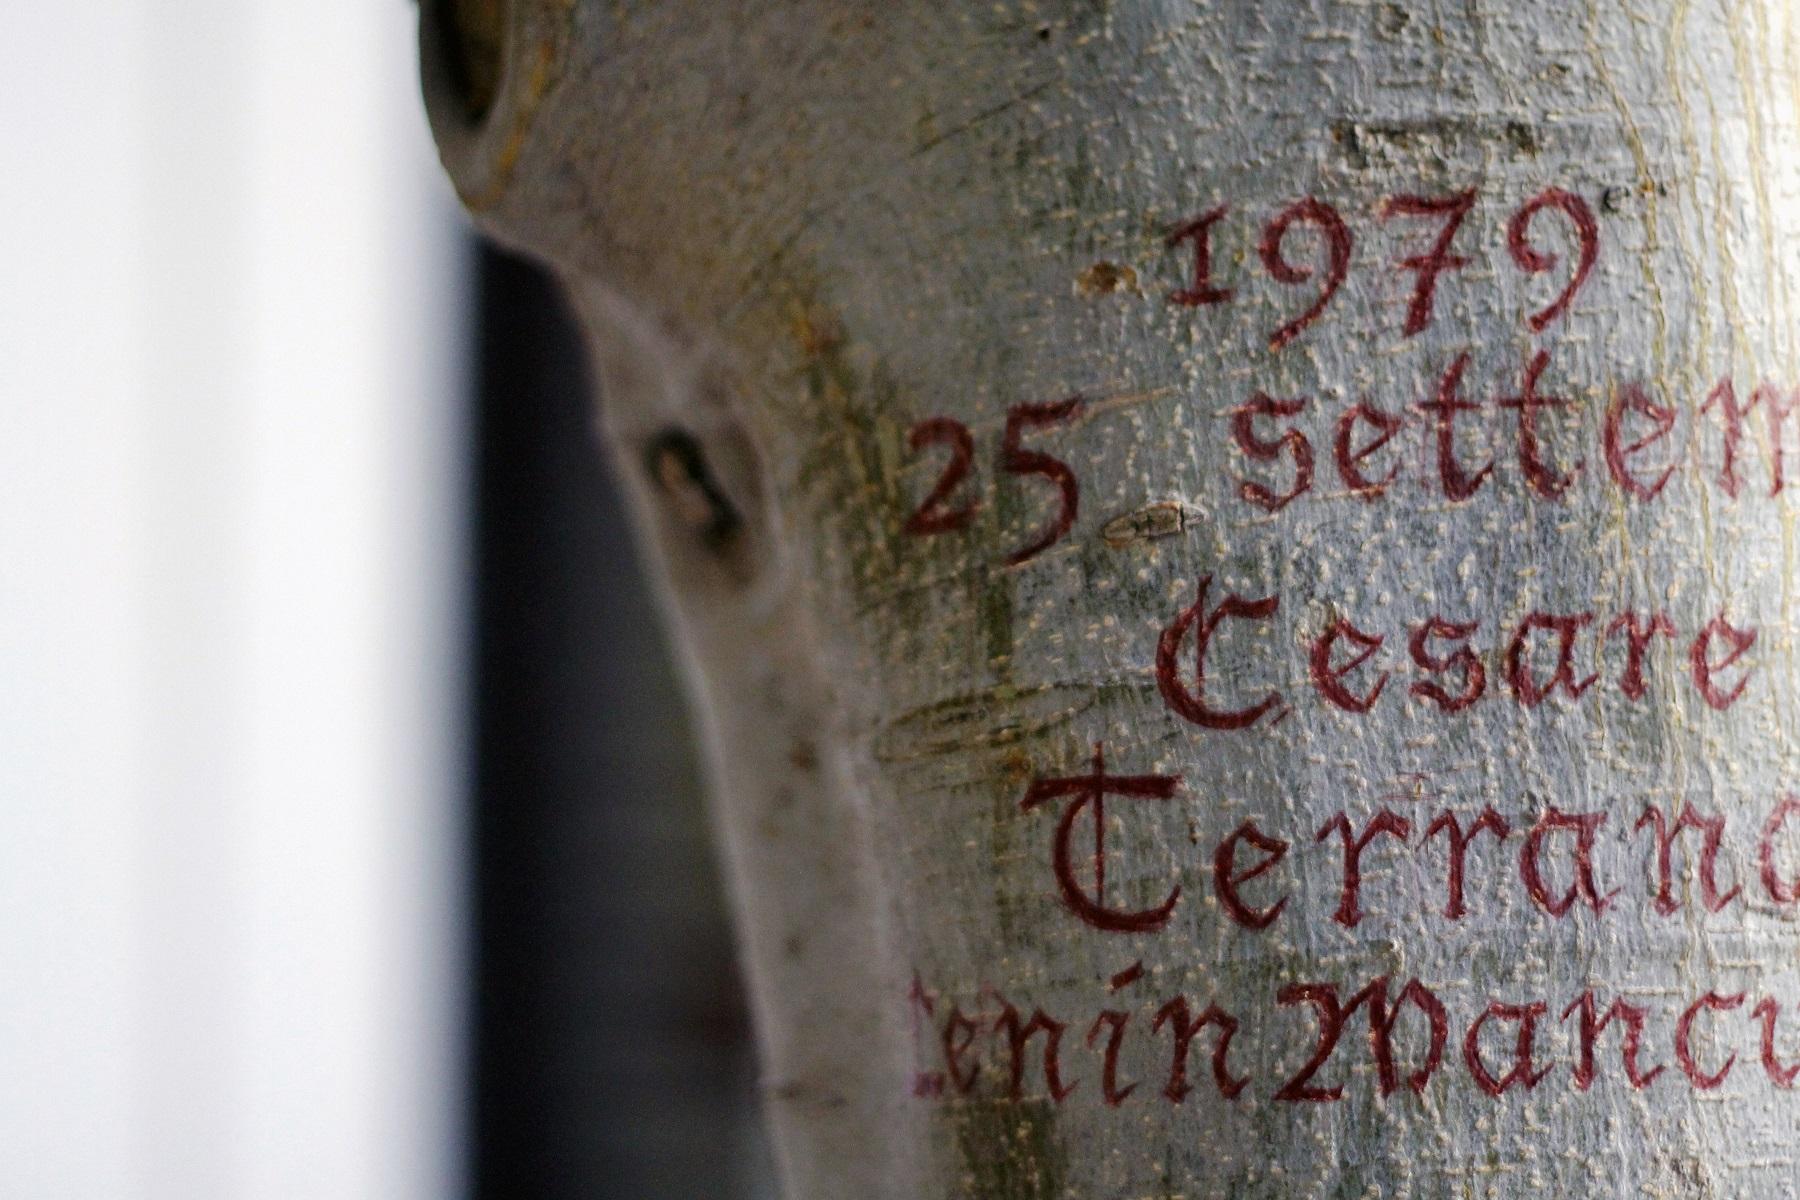 Goldschmied & Chiari_Genealogia di Damnatio Memoriae, Palermo 1947 1992